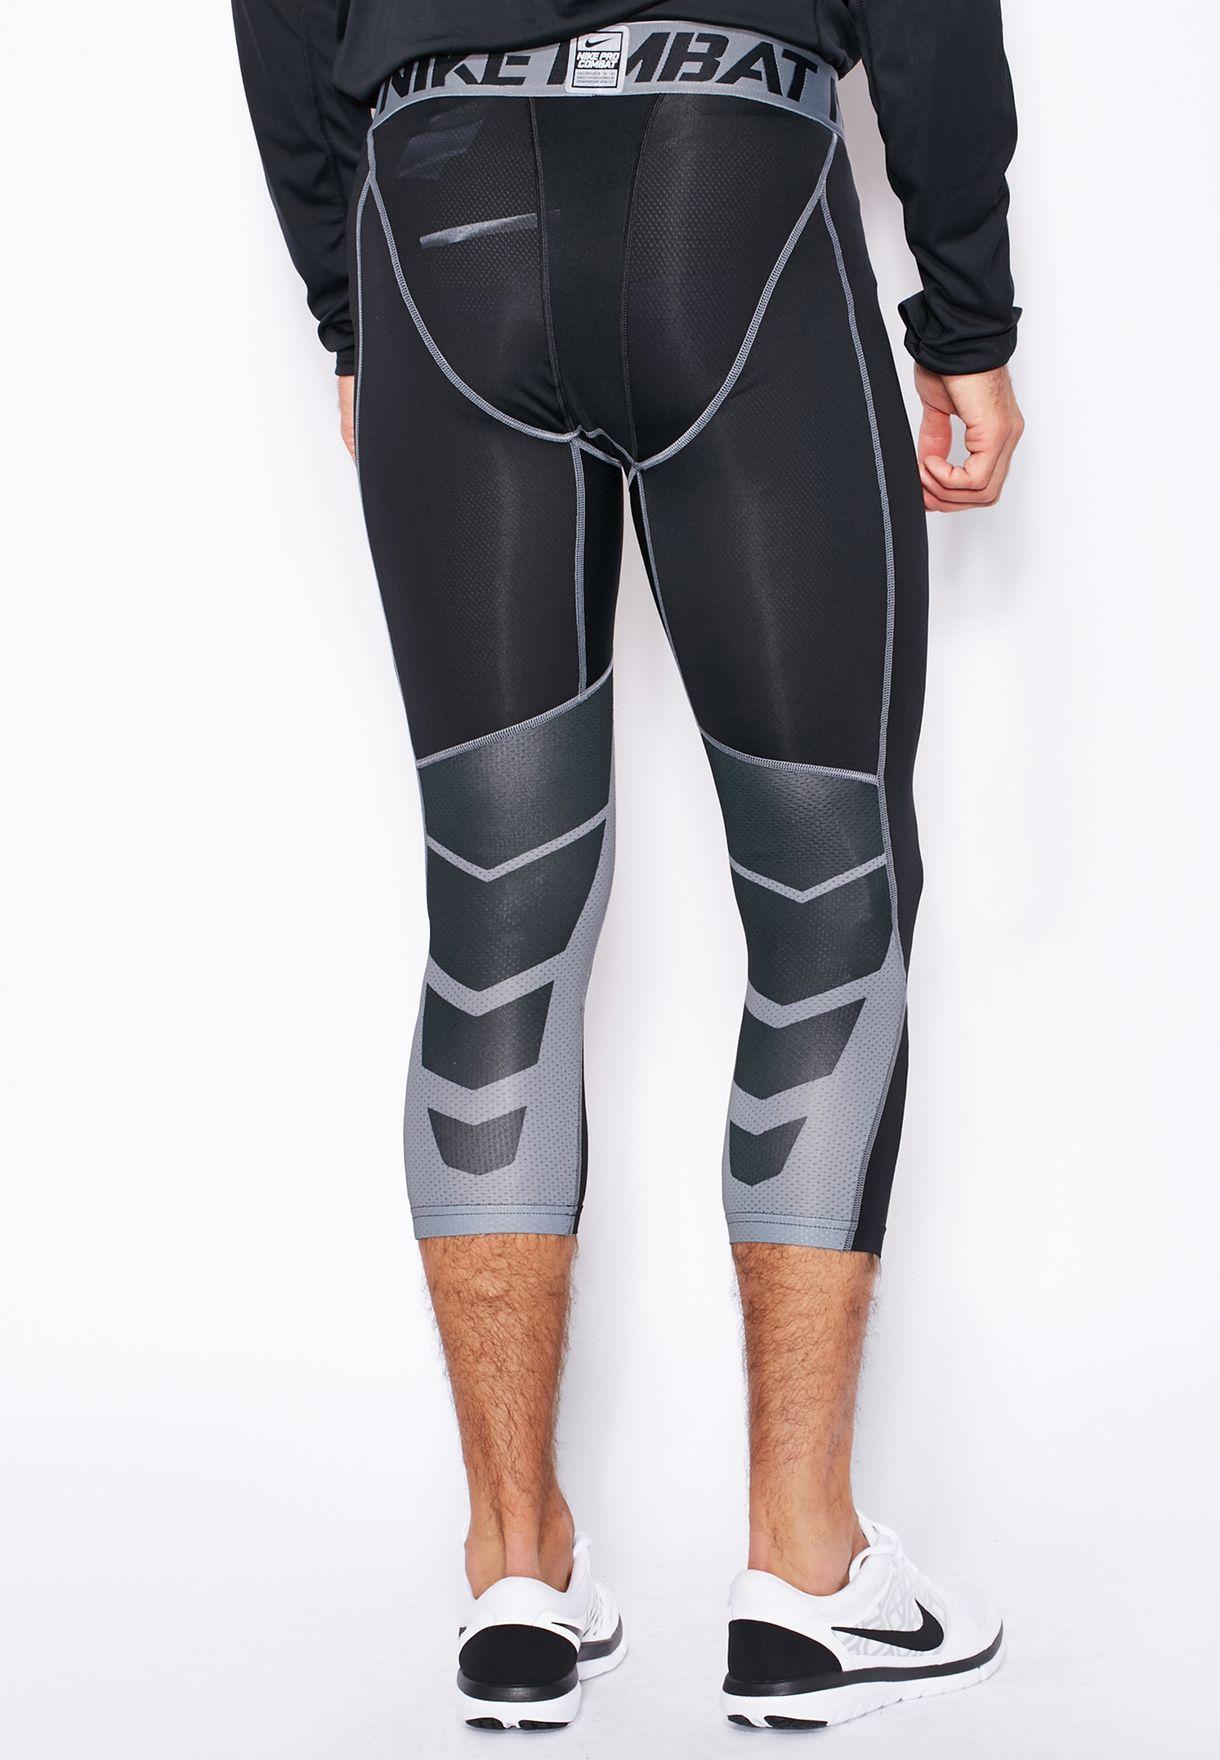 90b3b32296ceb Shop Nike black Hypercool Compression 3/4 Tights 636161-010 for Men ...